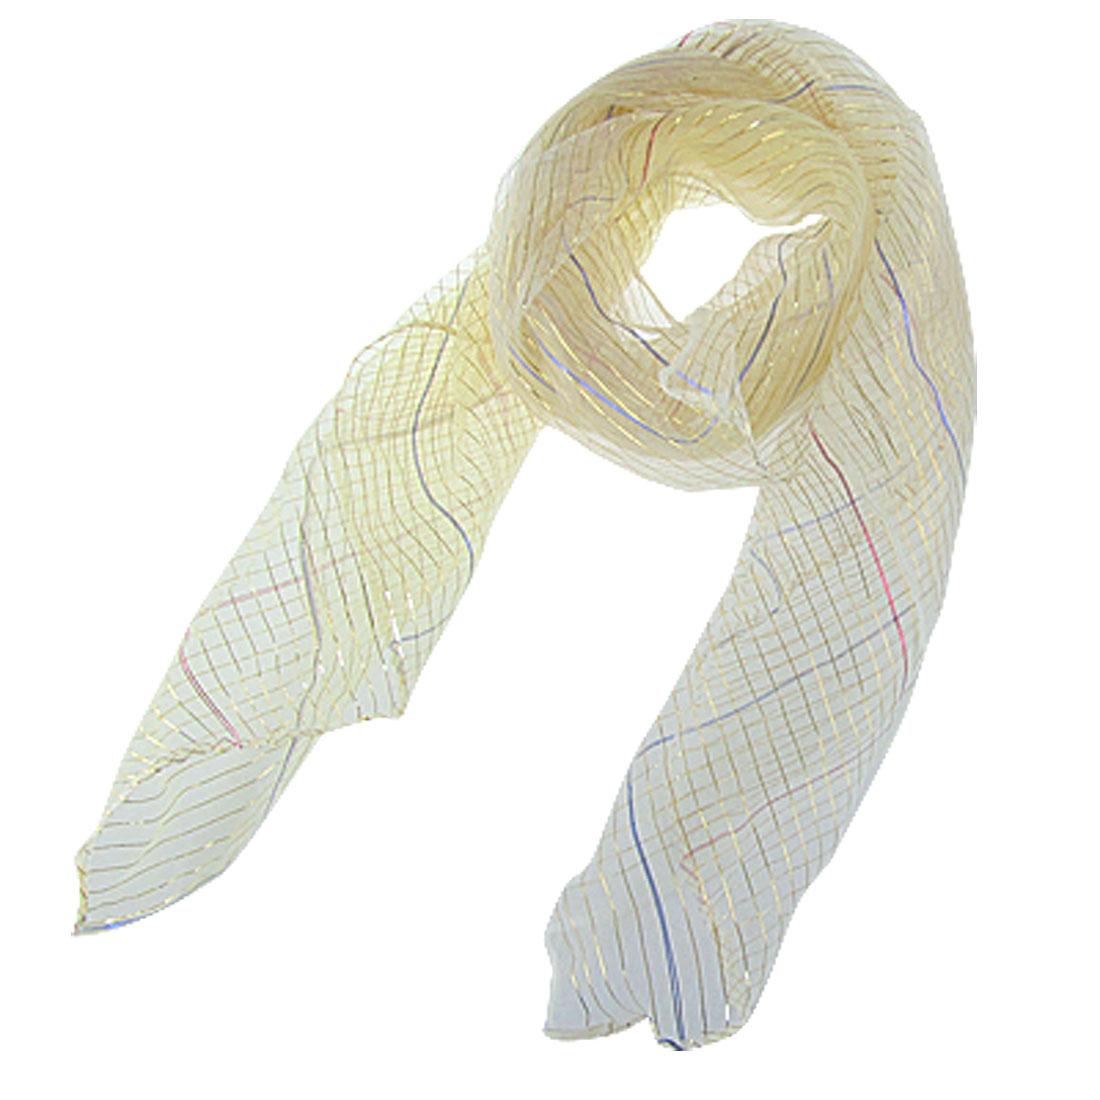 "Beige Sheer Nylon Scarf Neck Wrap 25"" x 24"" for Women"